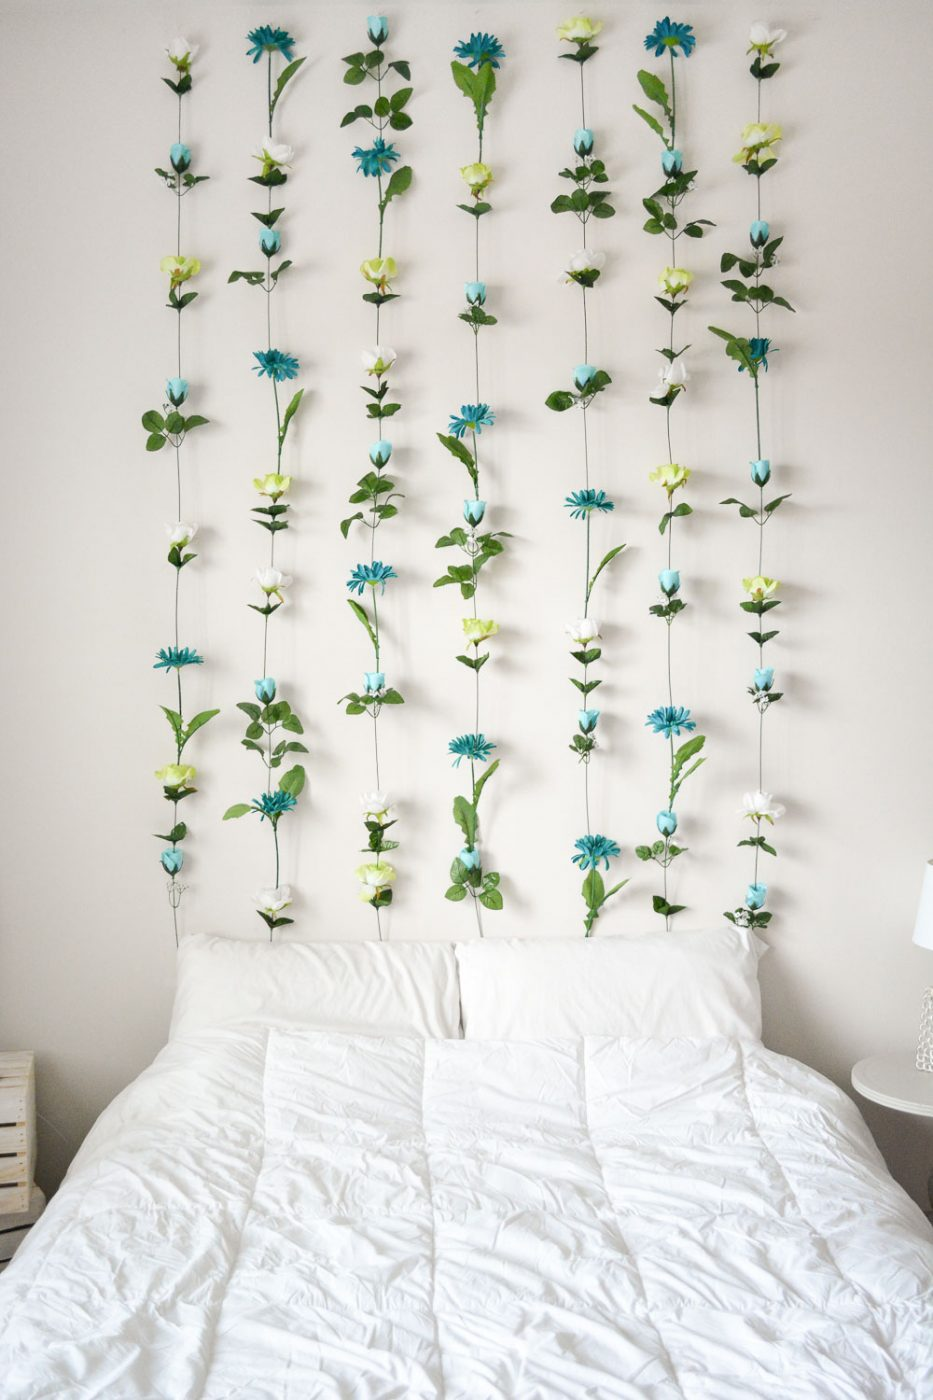 Hanging Plants Room